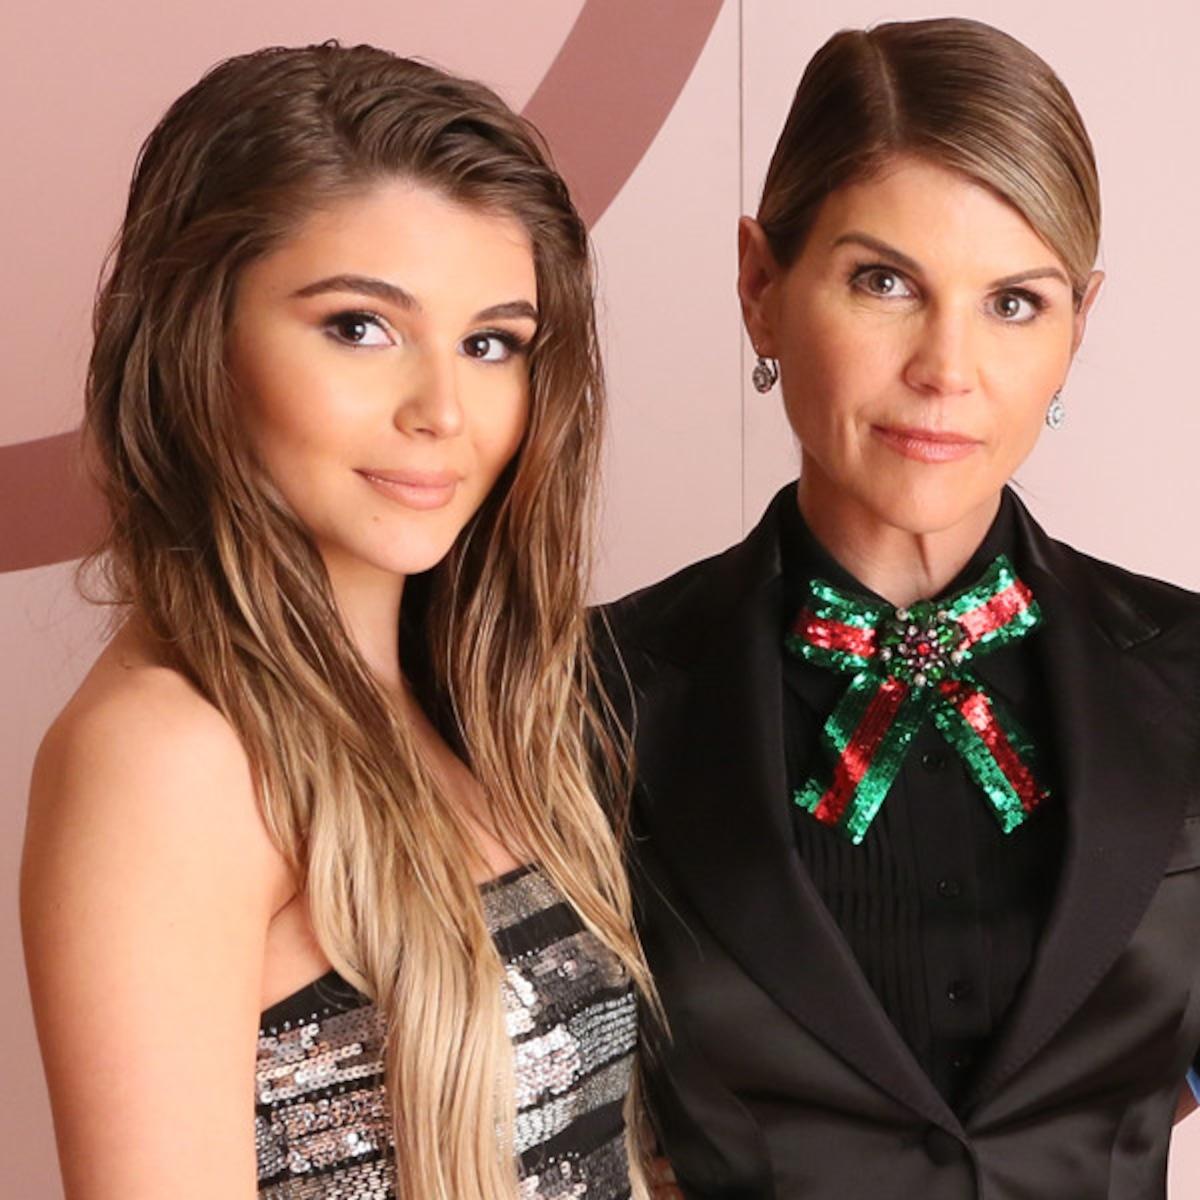 Lori Loughlin S Daughter Olivia Jade Loses Sephora Deal Amid Scandal E Online